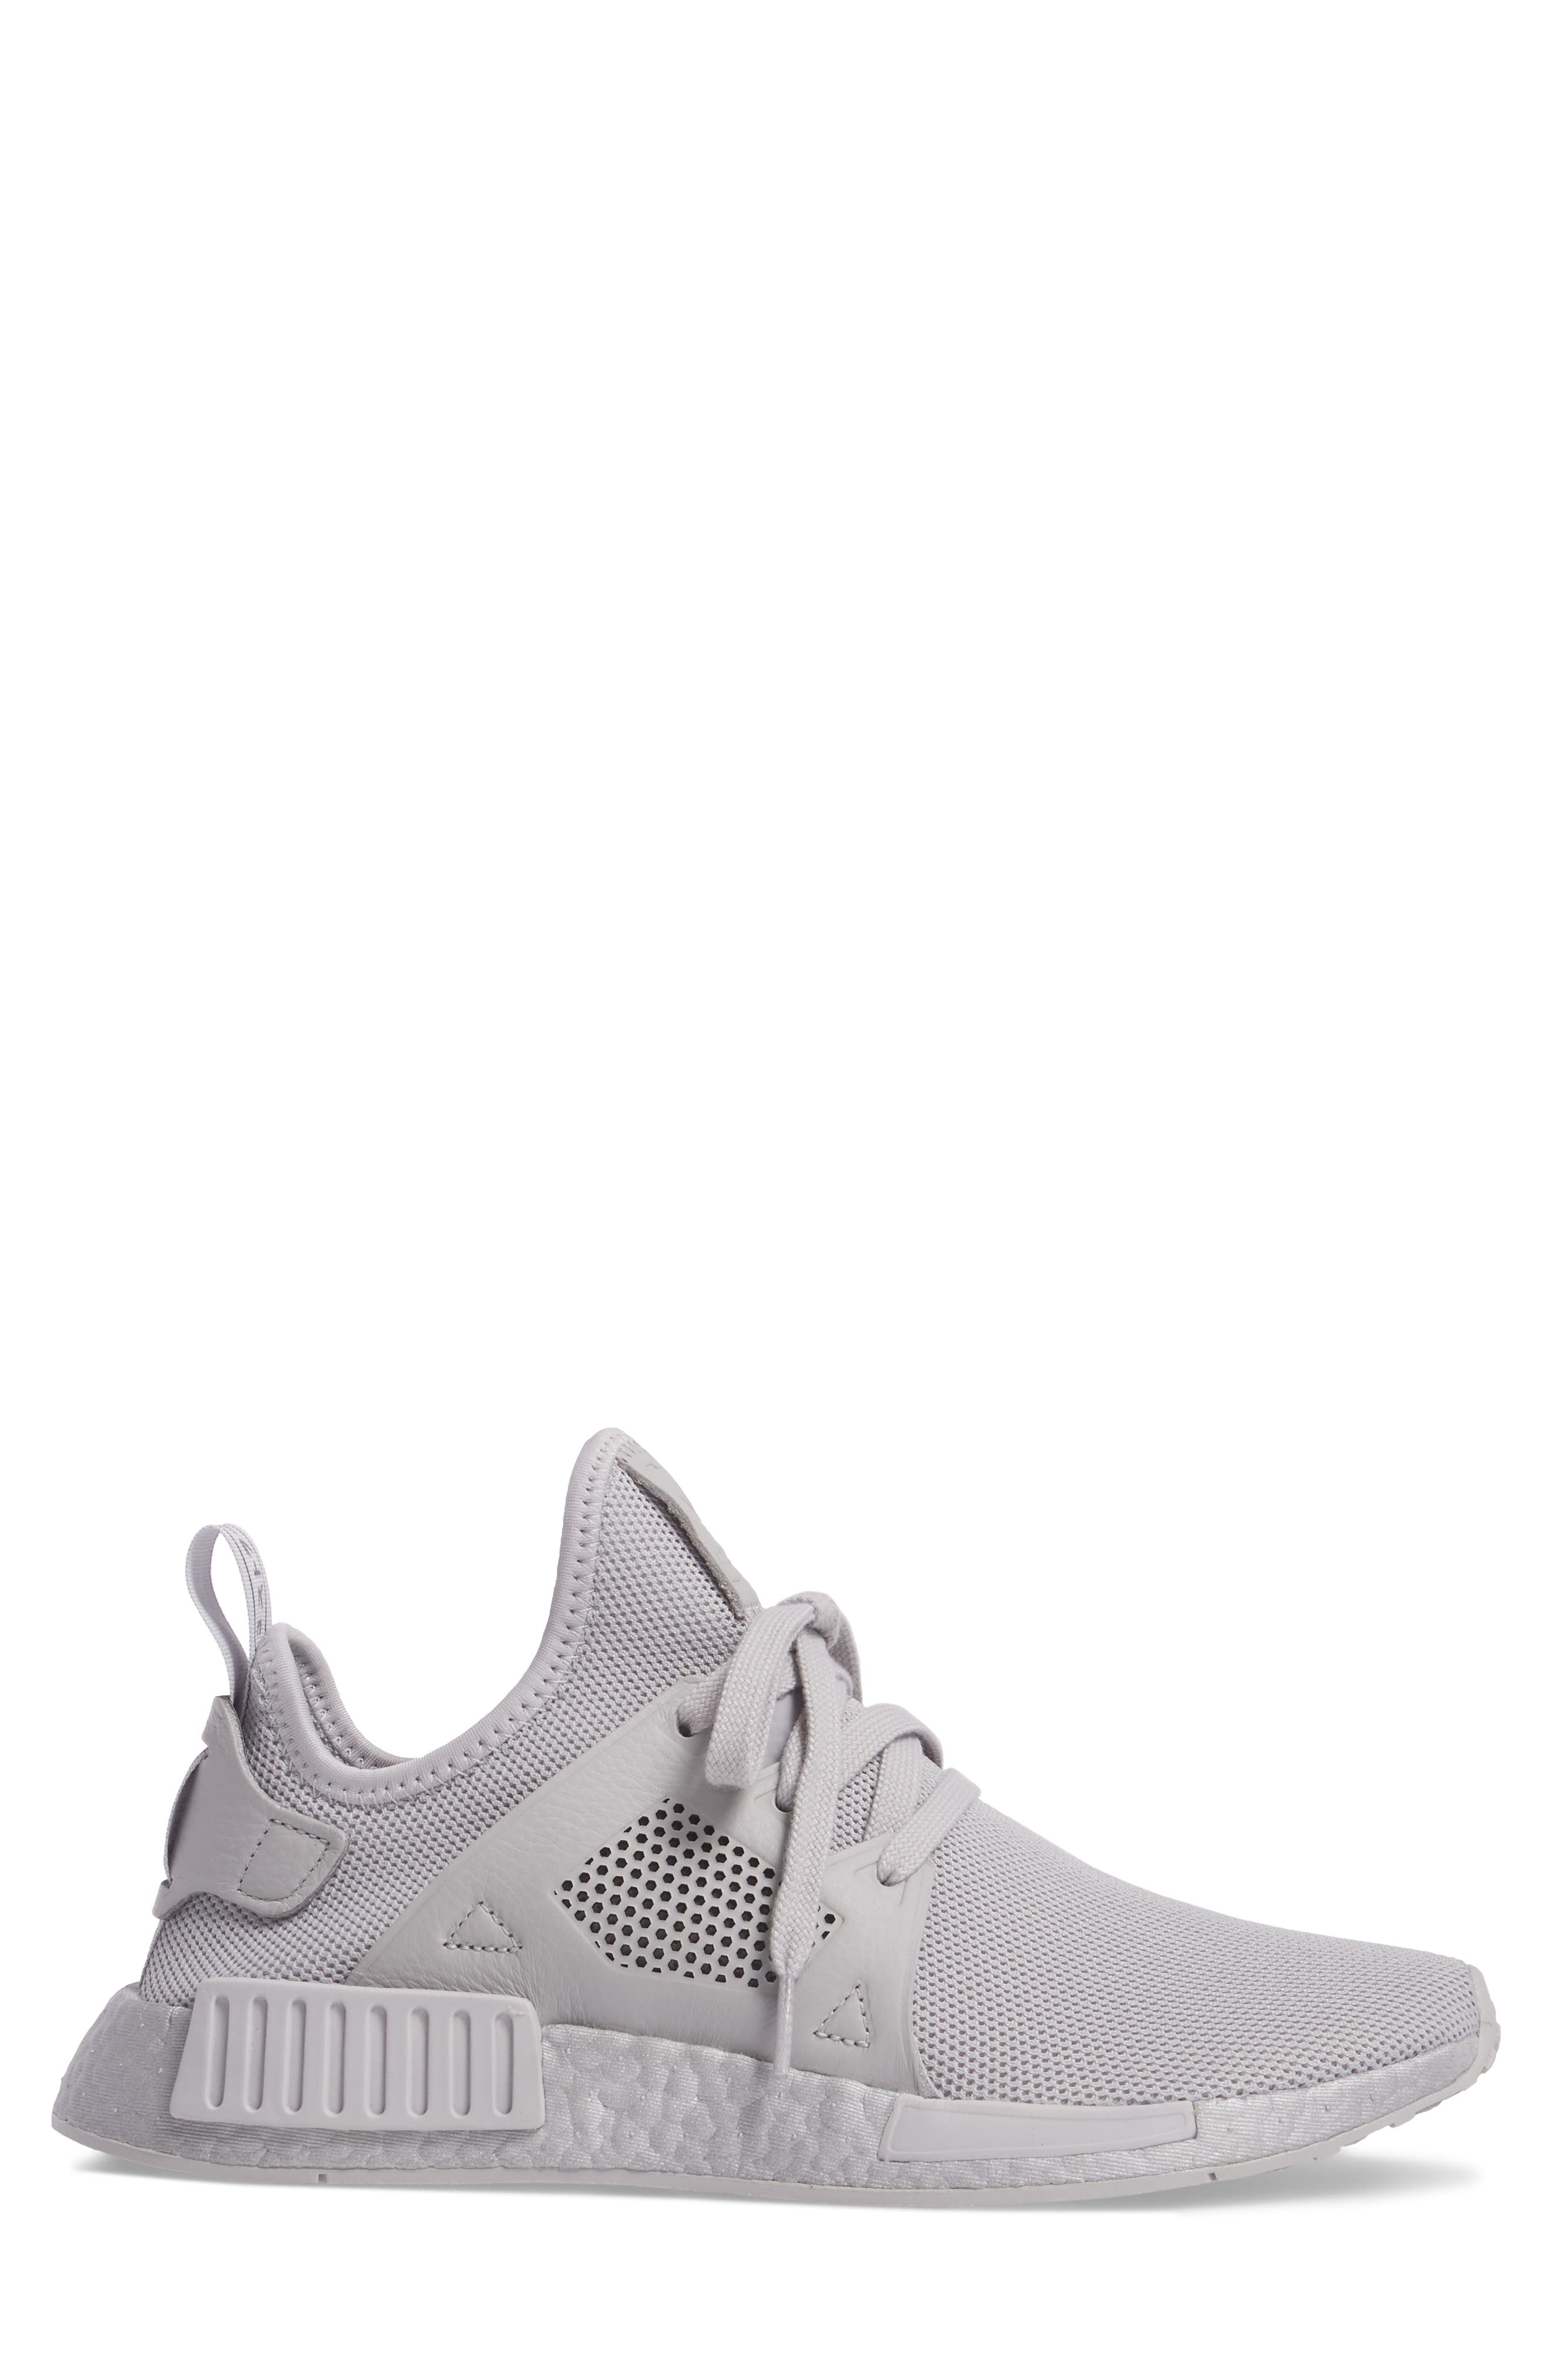 NMD XR1 Sneaker,                             Alternate thumbnail 3, color,                             020